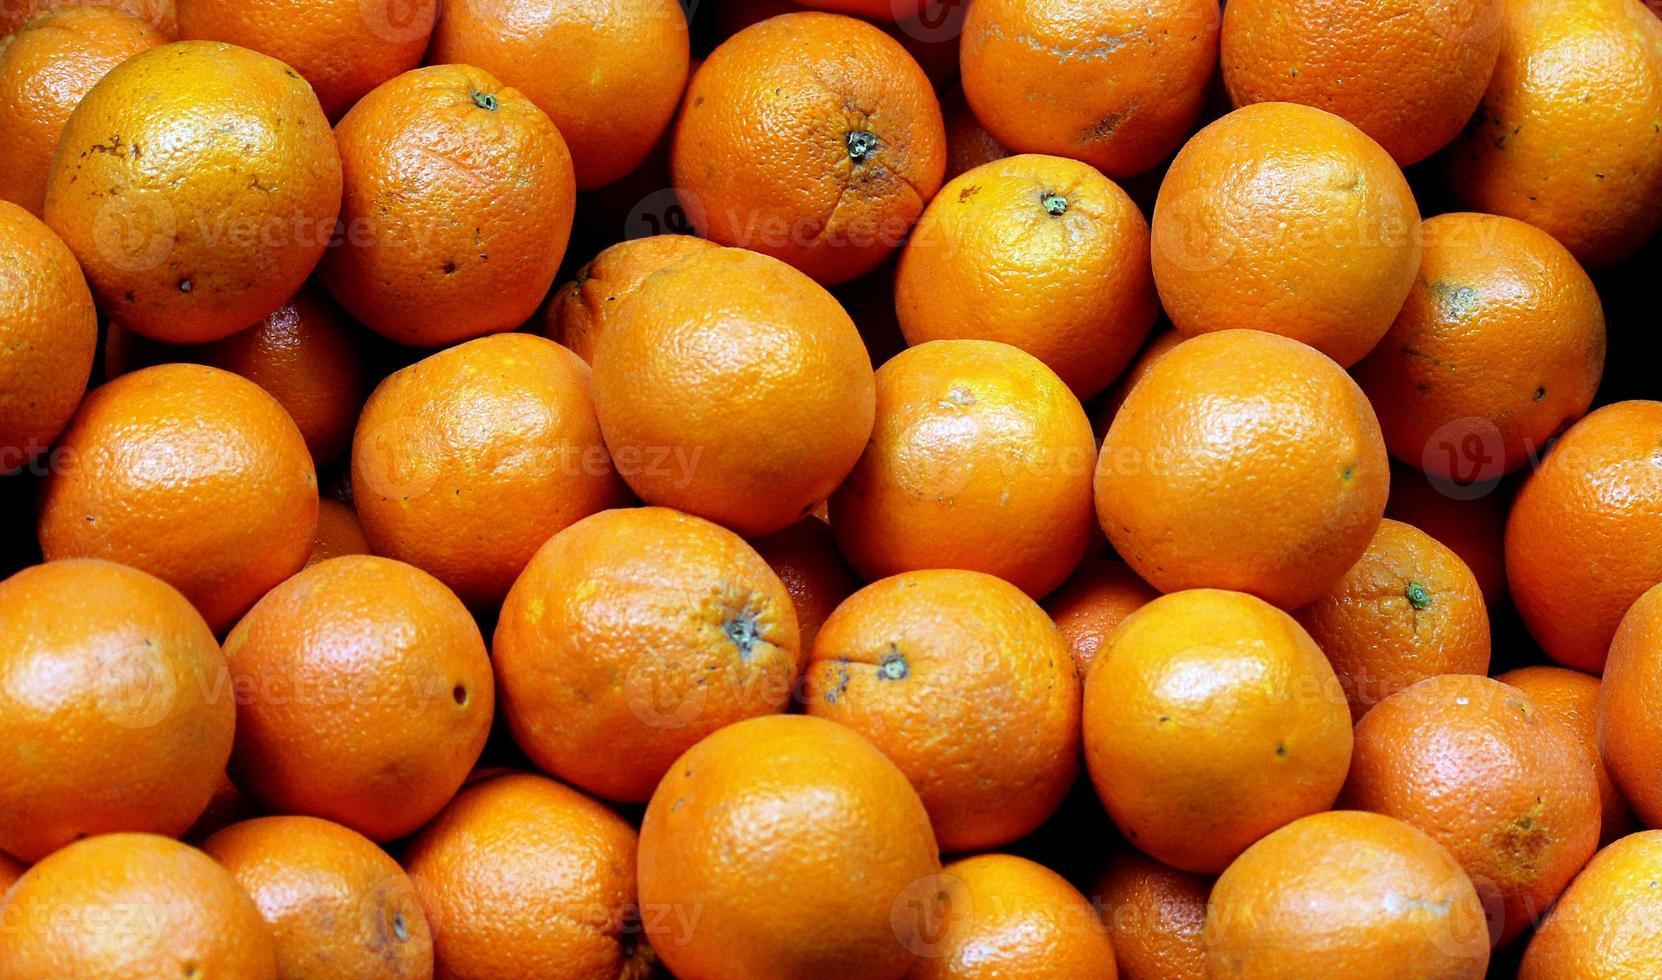 Bunch of fresh  oranges on market. Selective focus photo